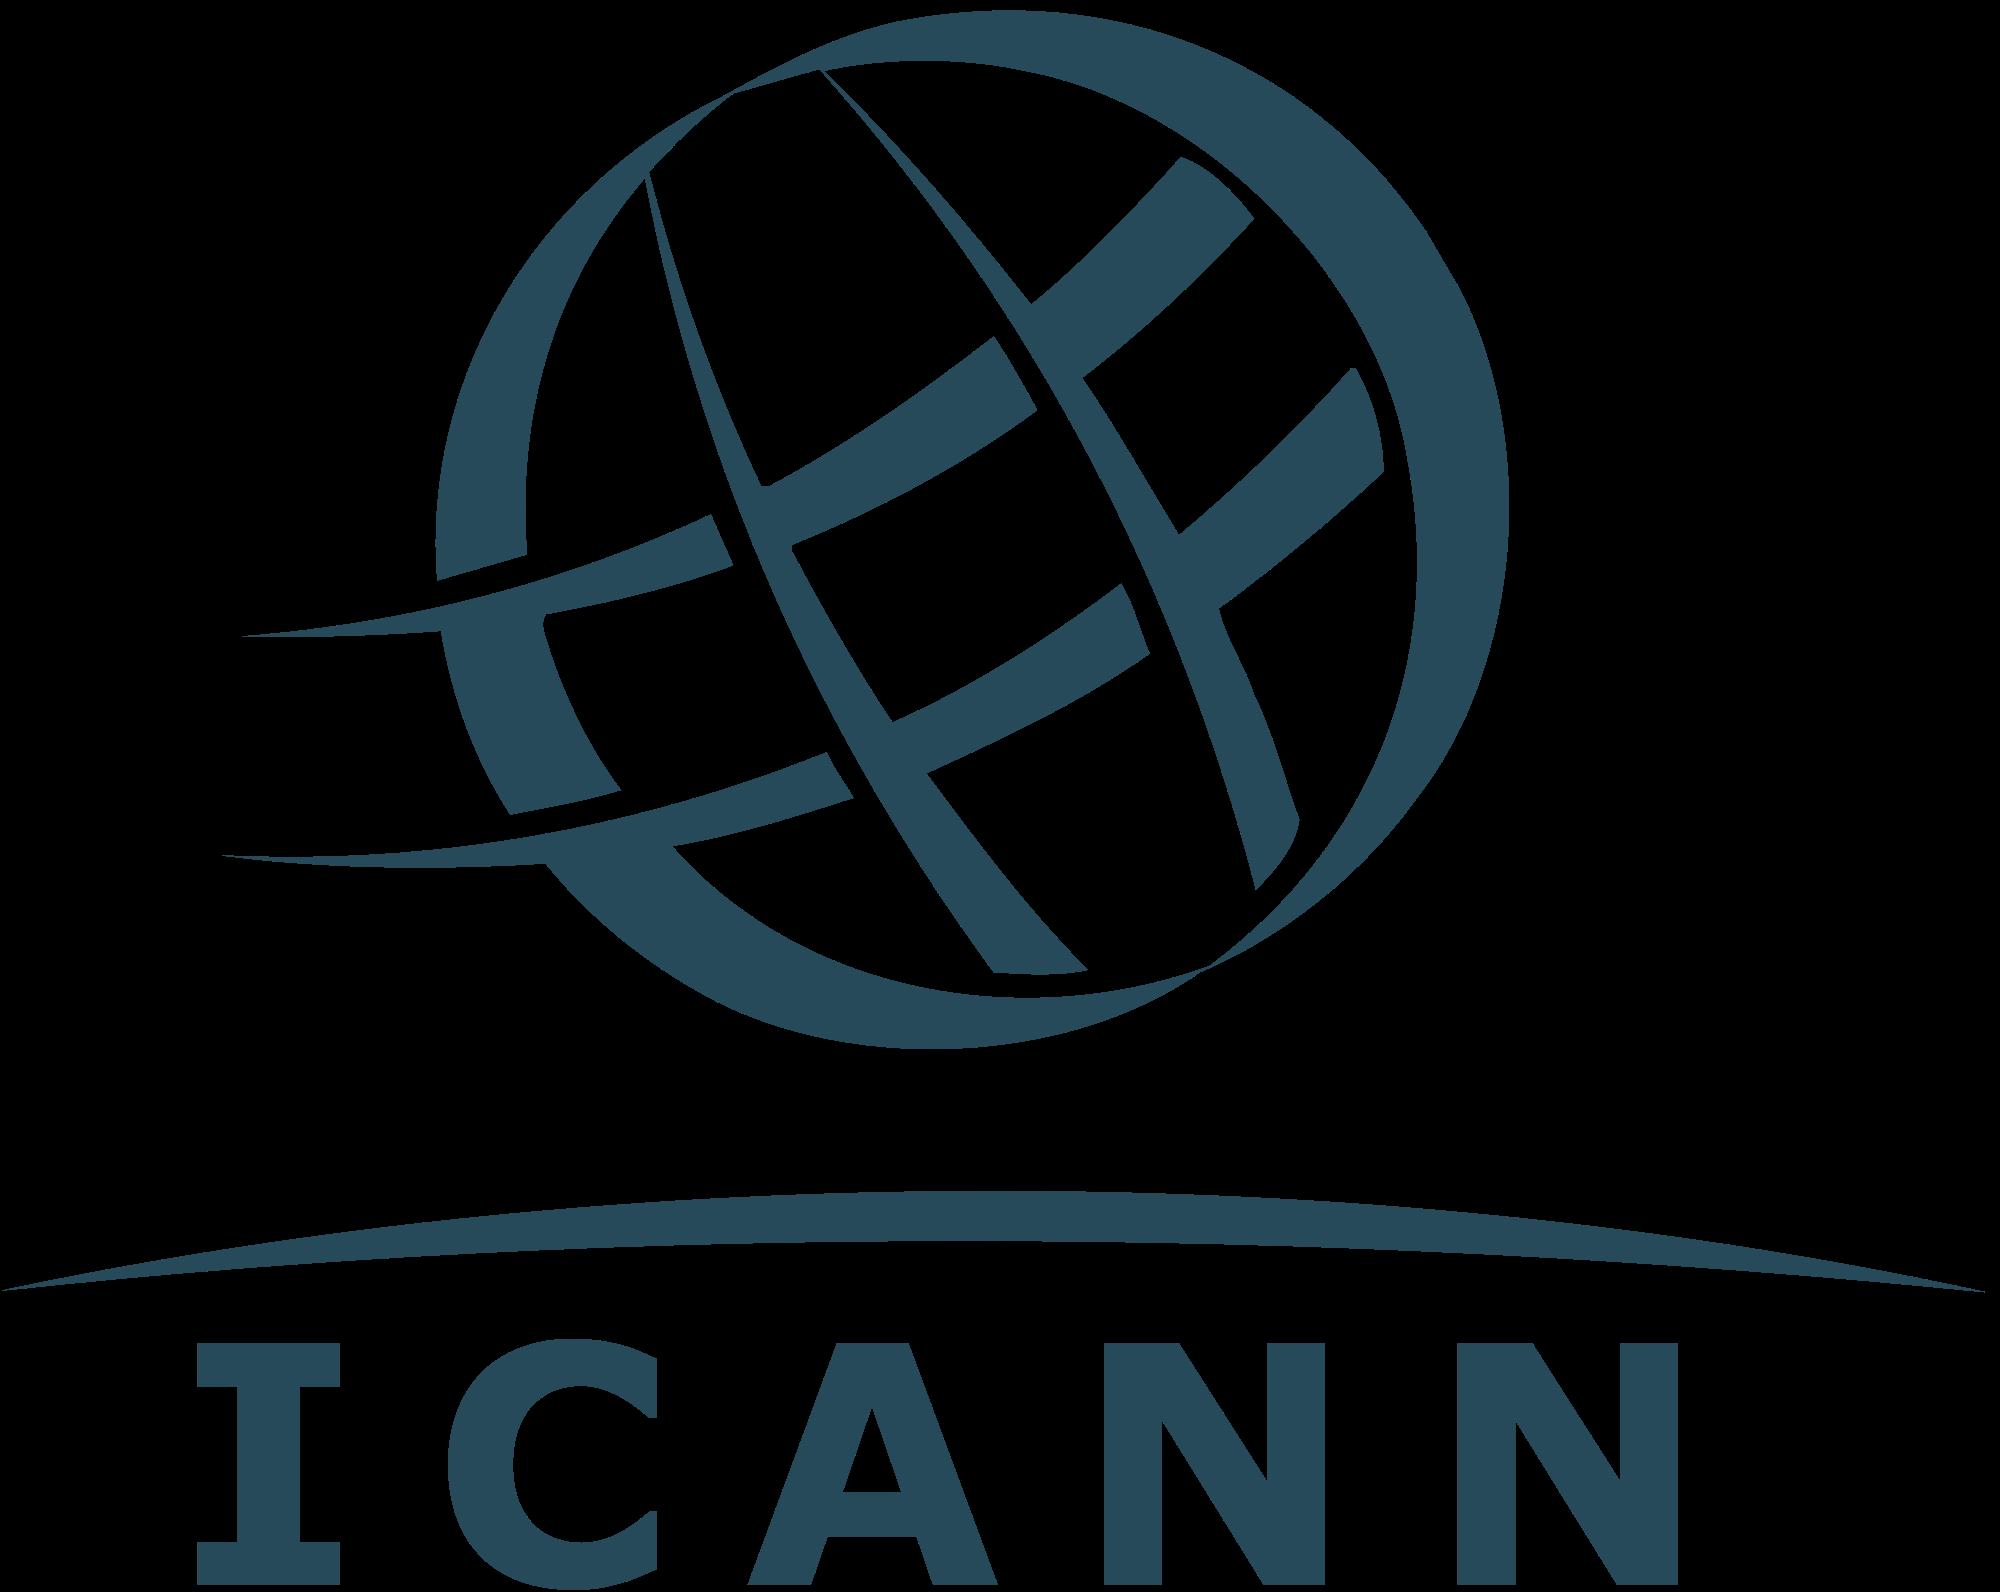 Icann Logo PNG